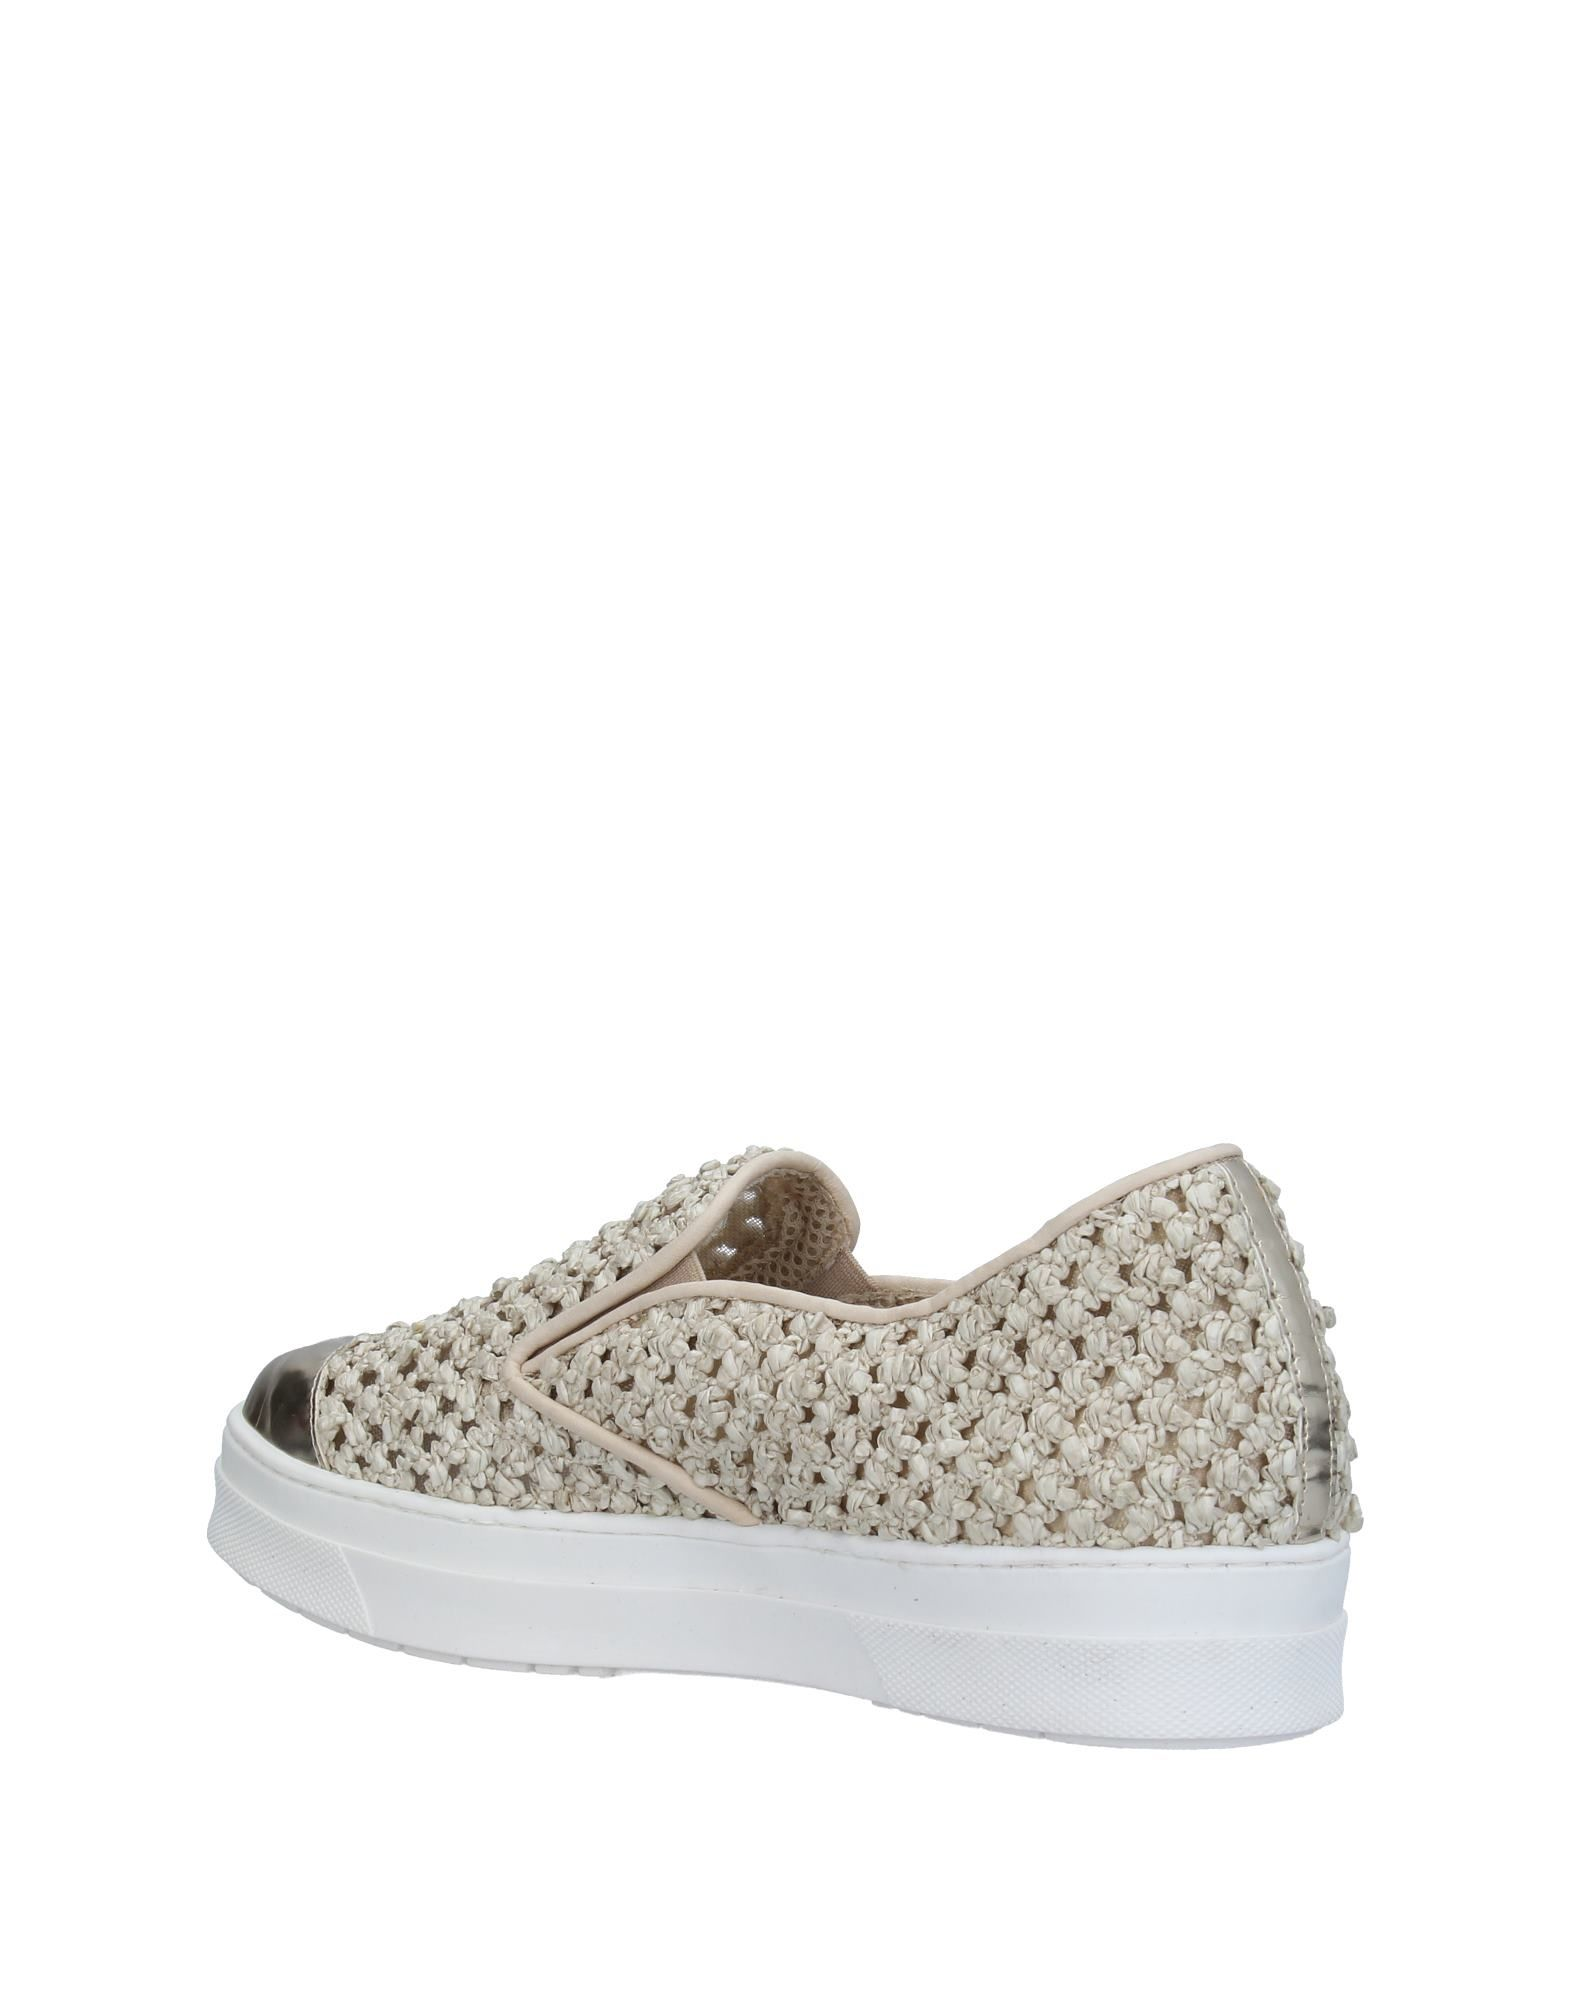 Sgn Giancarlo Paoli Sneakers Damen  11344005WF Gute Qualität beliebte Schuhe